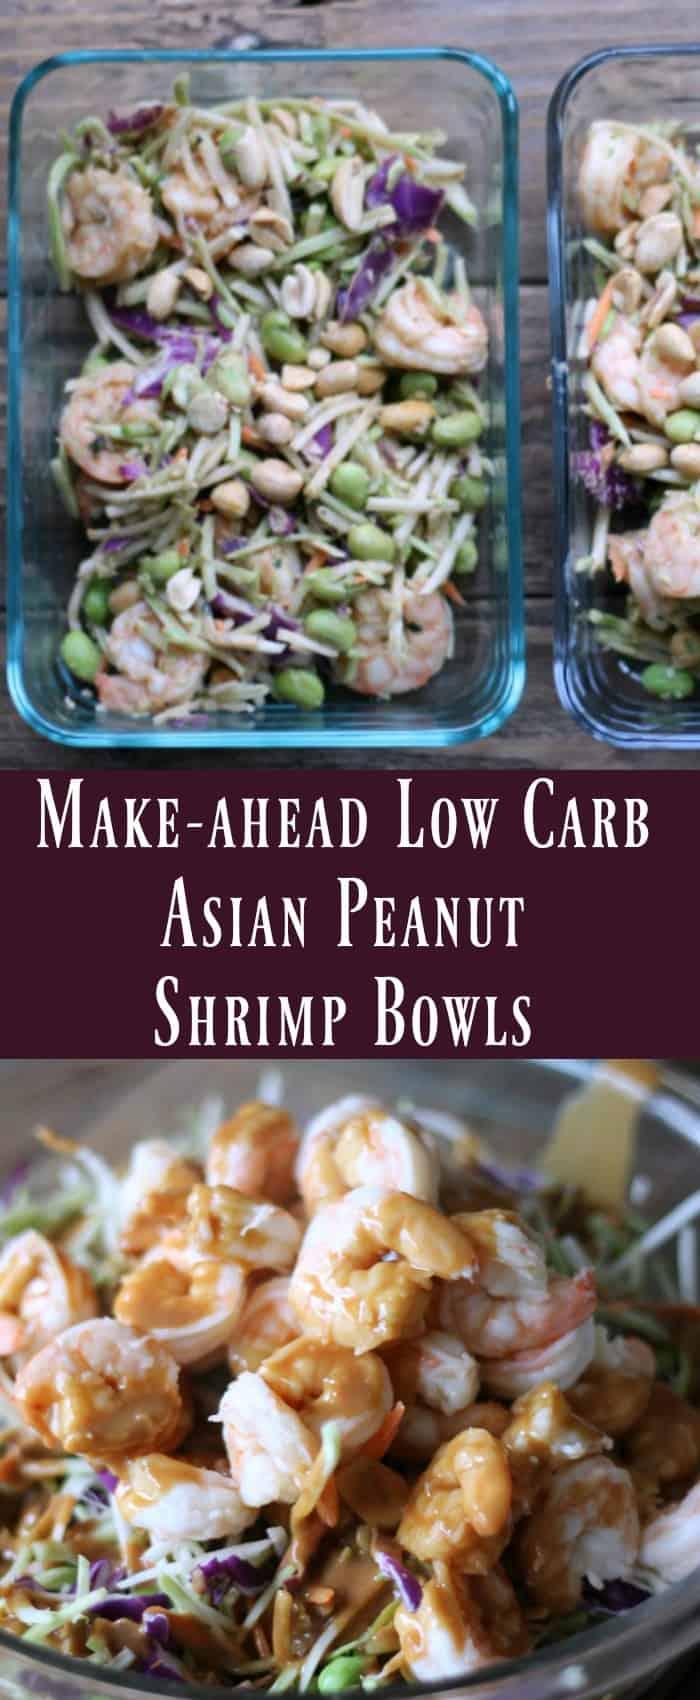 Make-ahead Low Carb Asian Peanut Shrimp Bowls